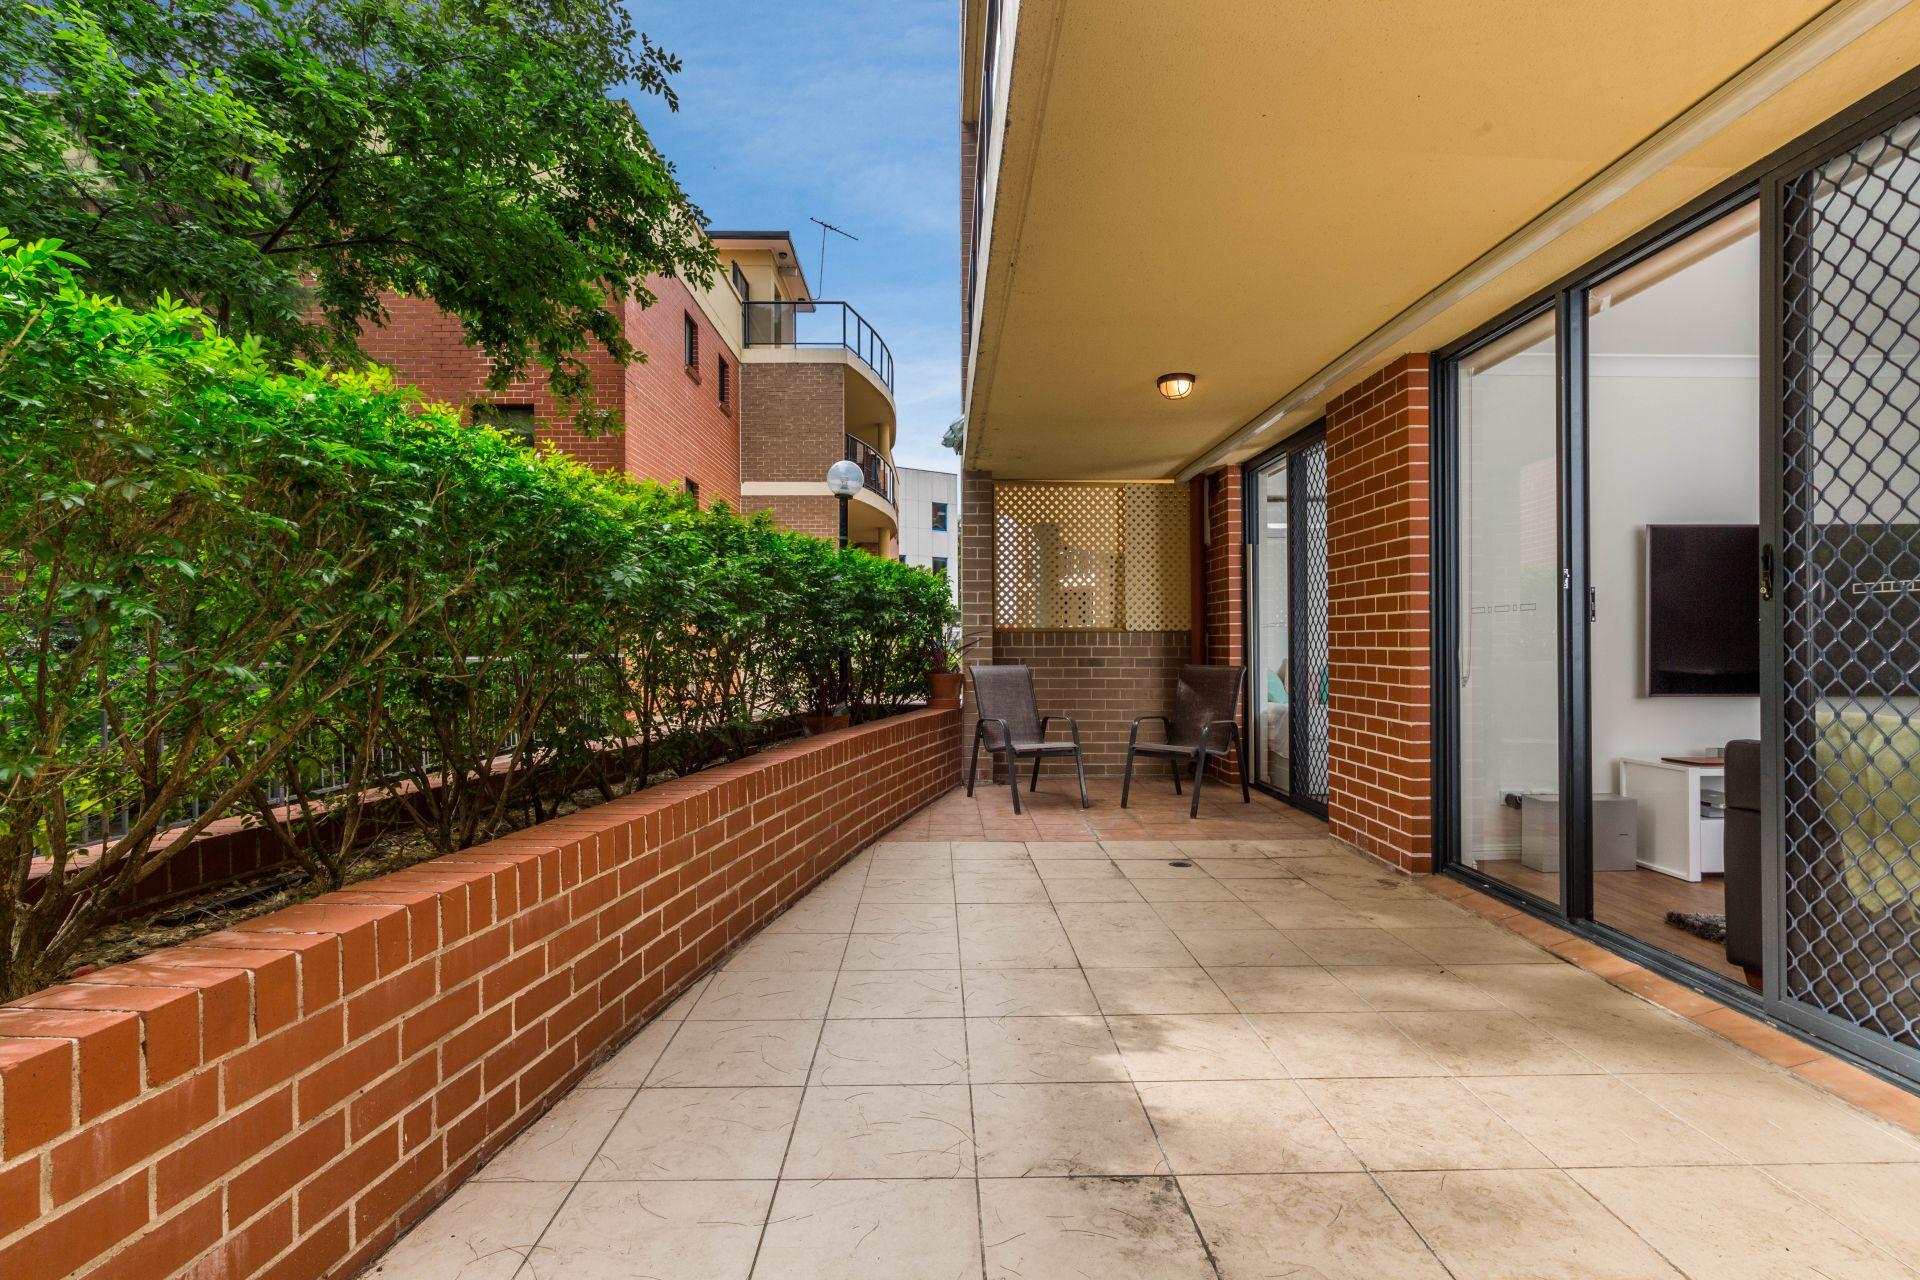 38/1-4 The Crescent, Strathfield NSW 2135